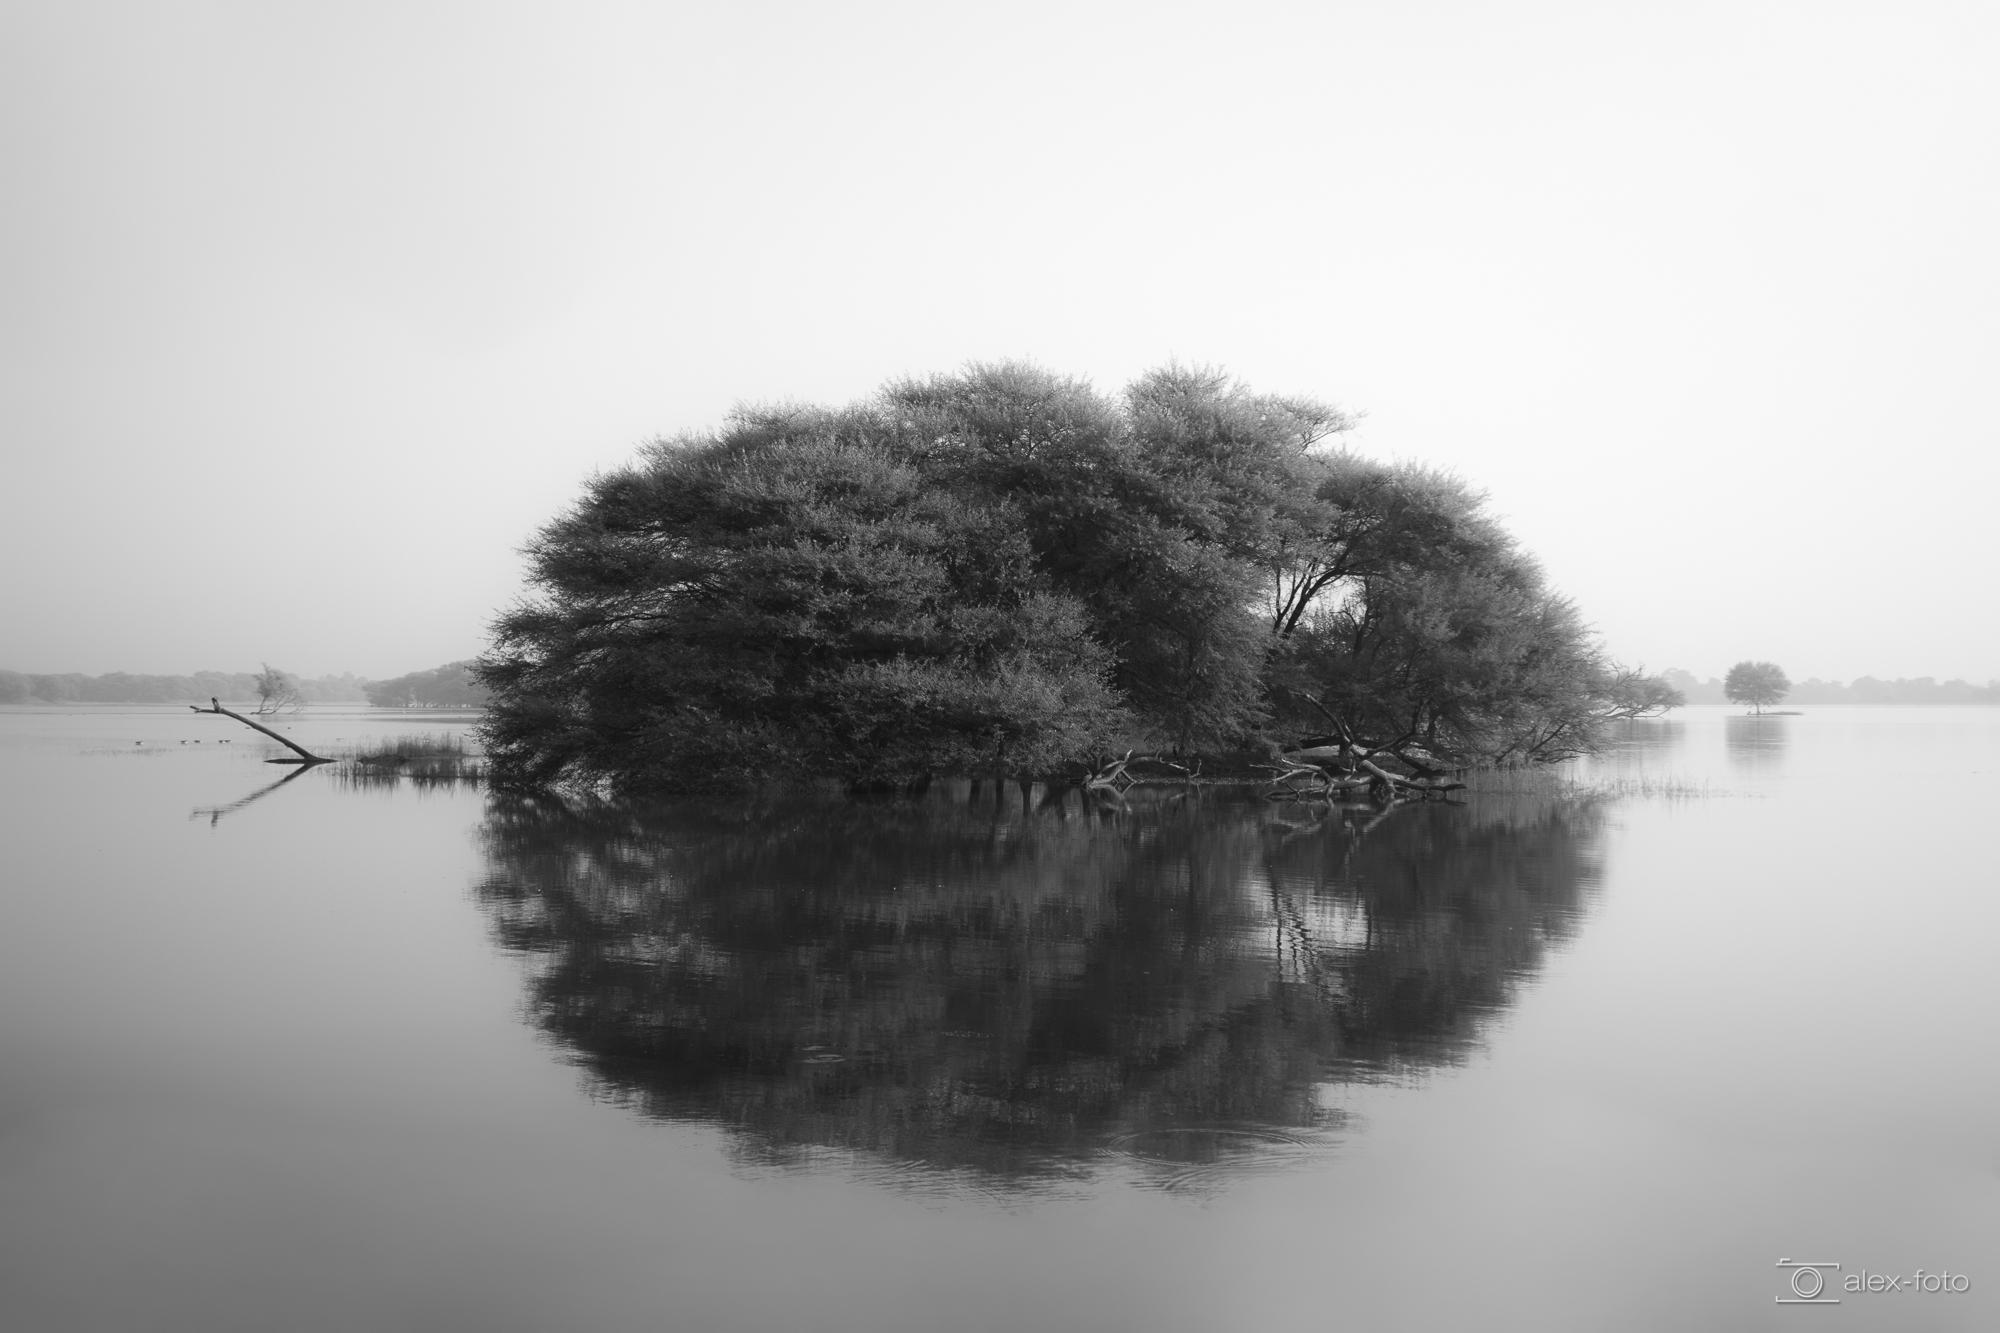 Lichtwert-BestOf_ThomasAlex_009_Ahmedabad - Thol Lake.jpg